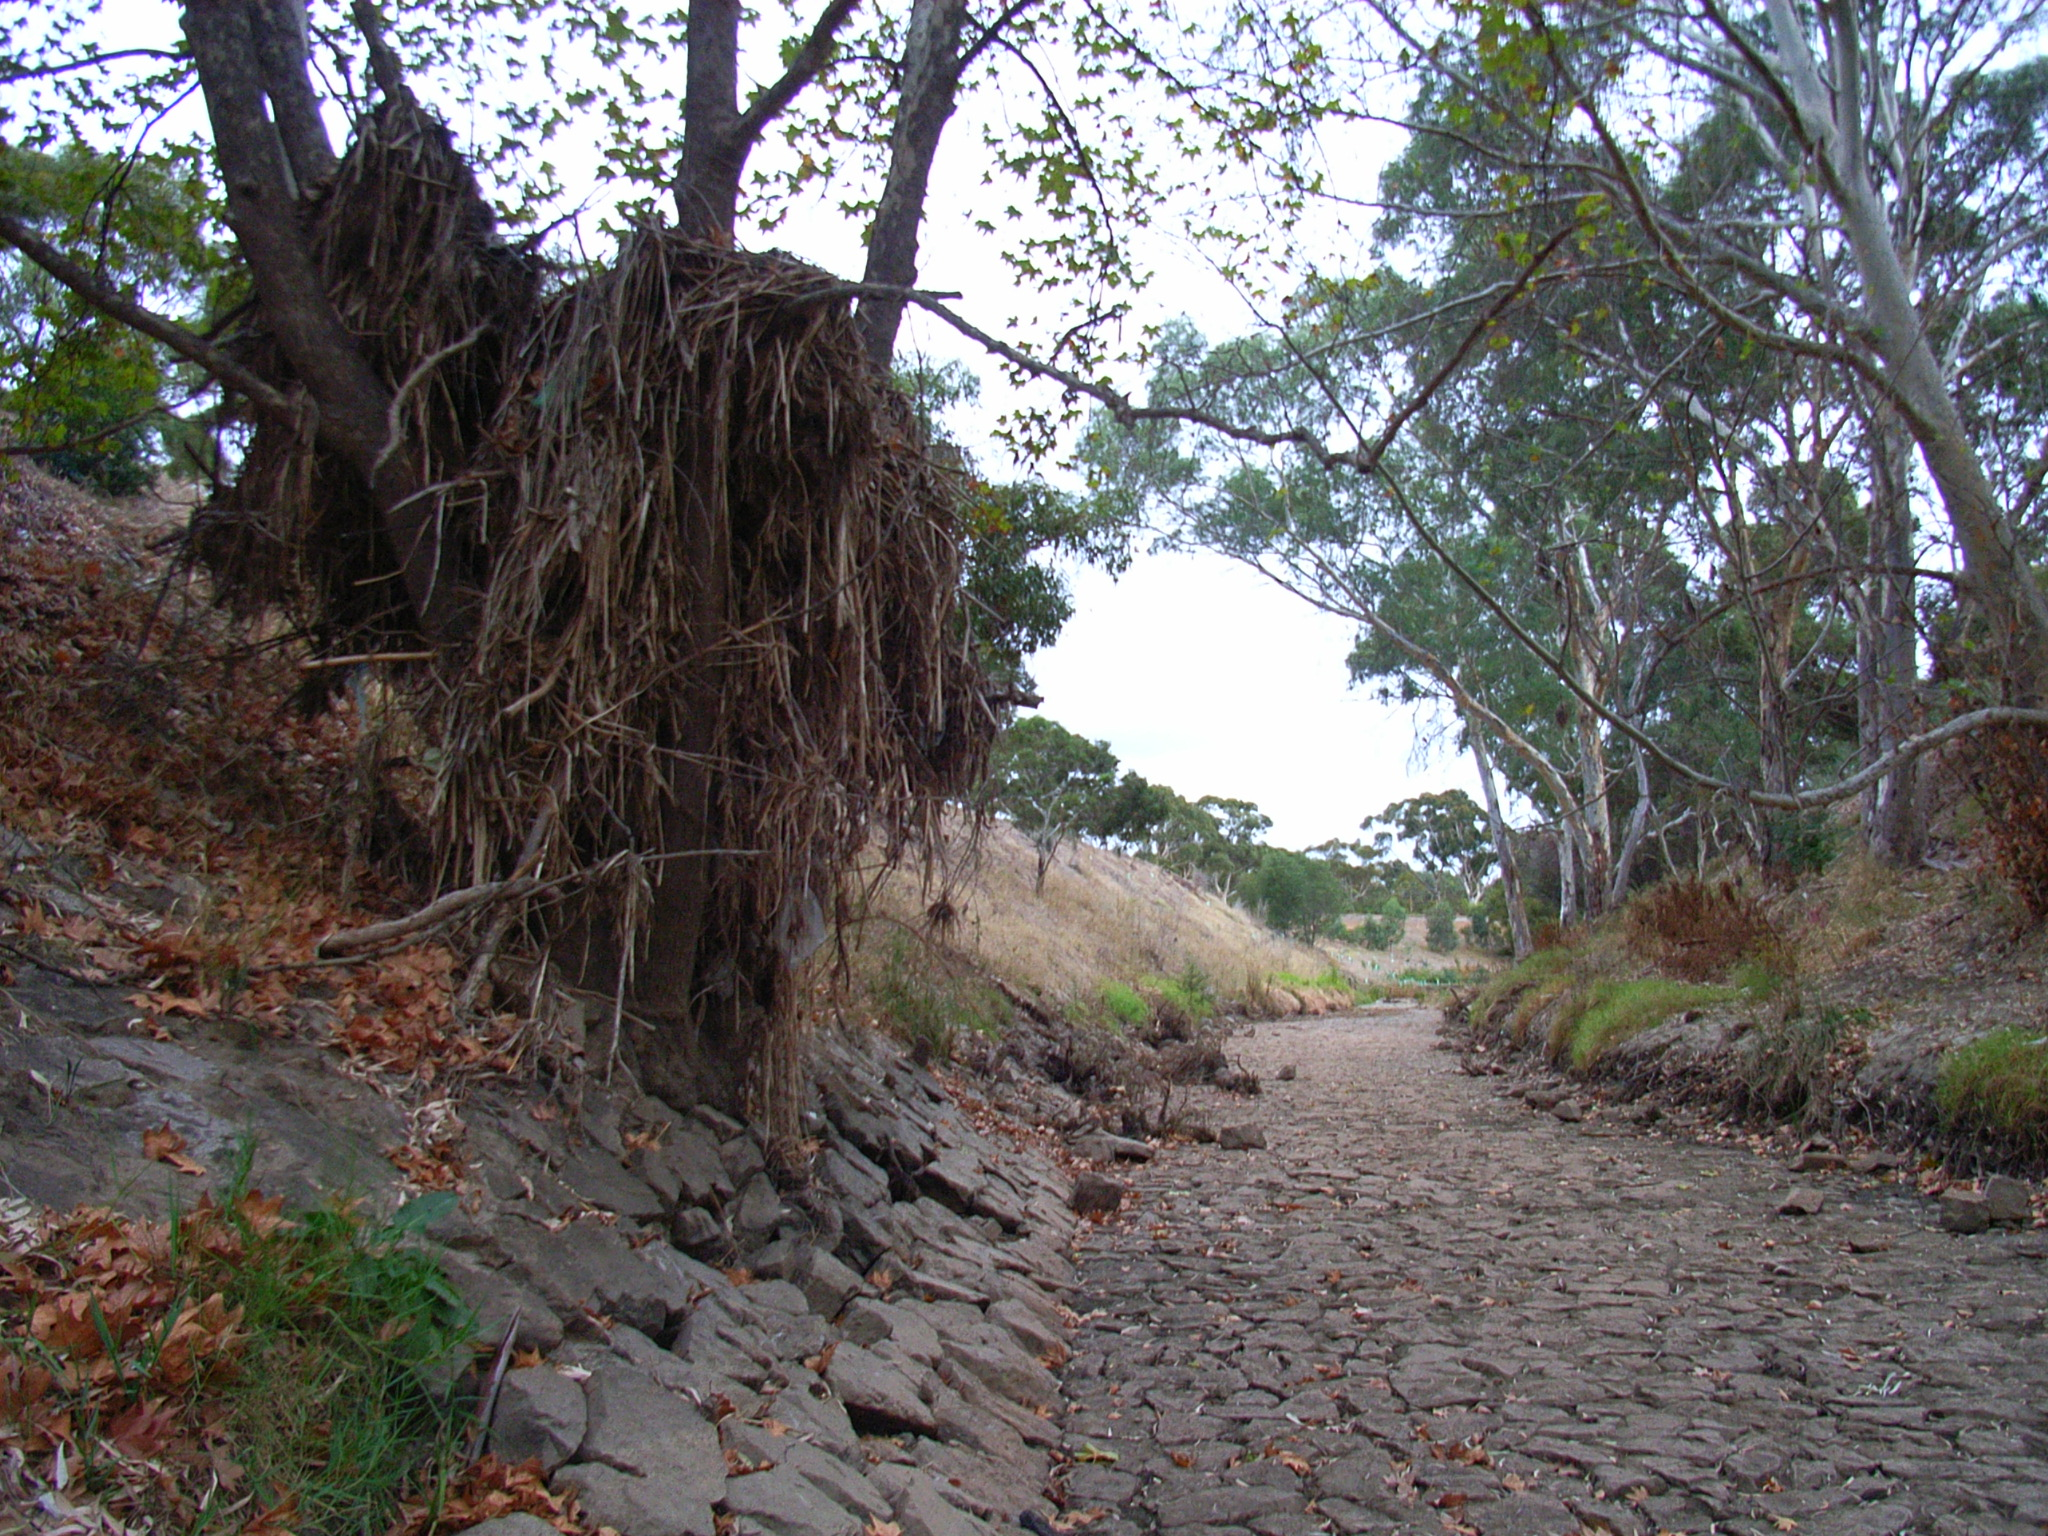 File Dry Creek Bed In Australia Jpg Wikimedia Commons